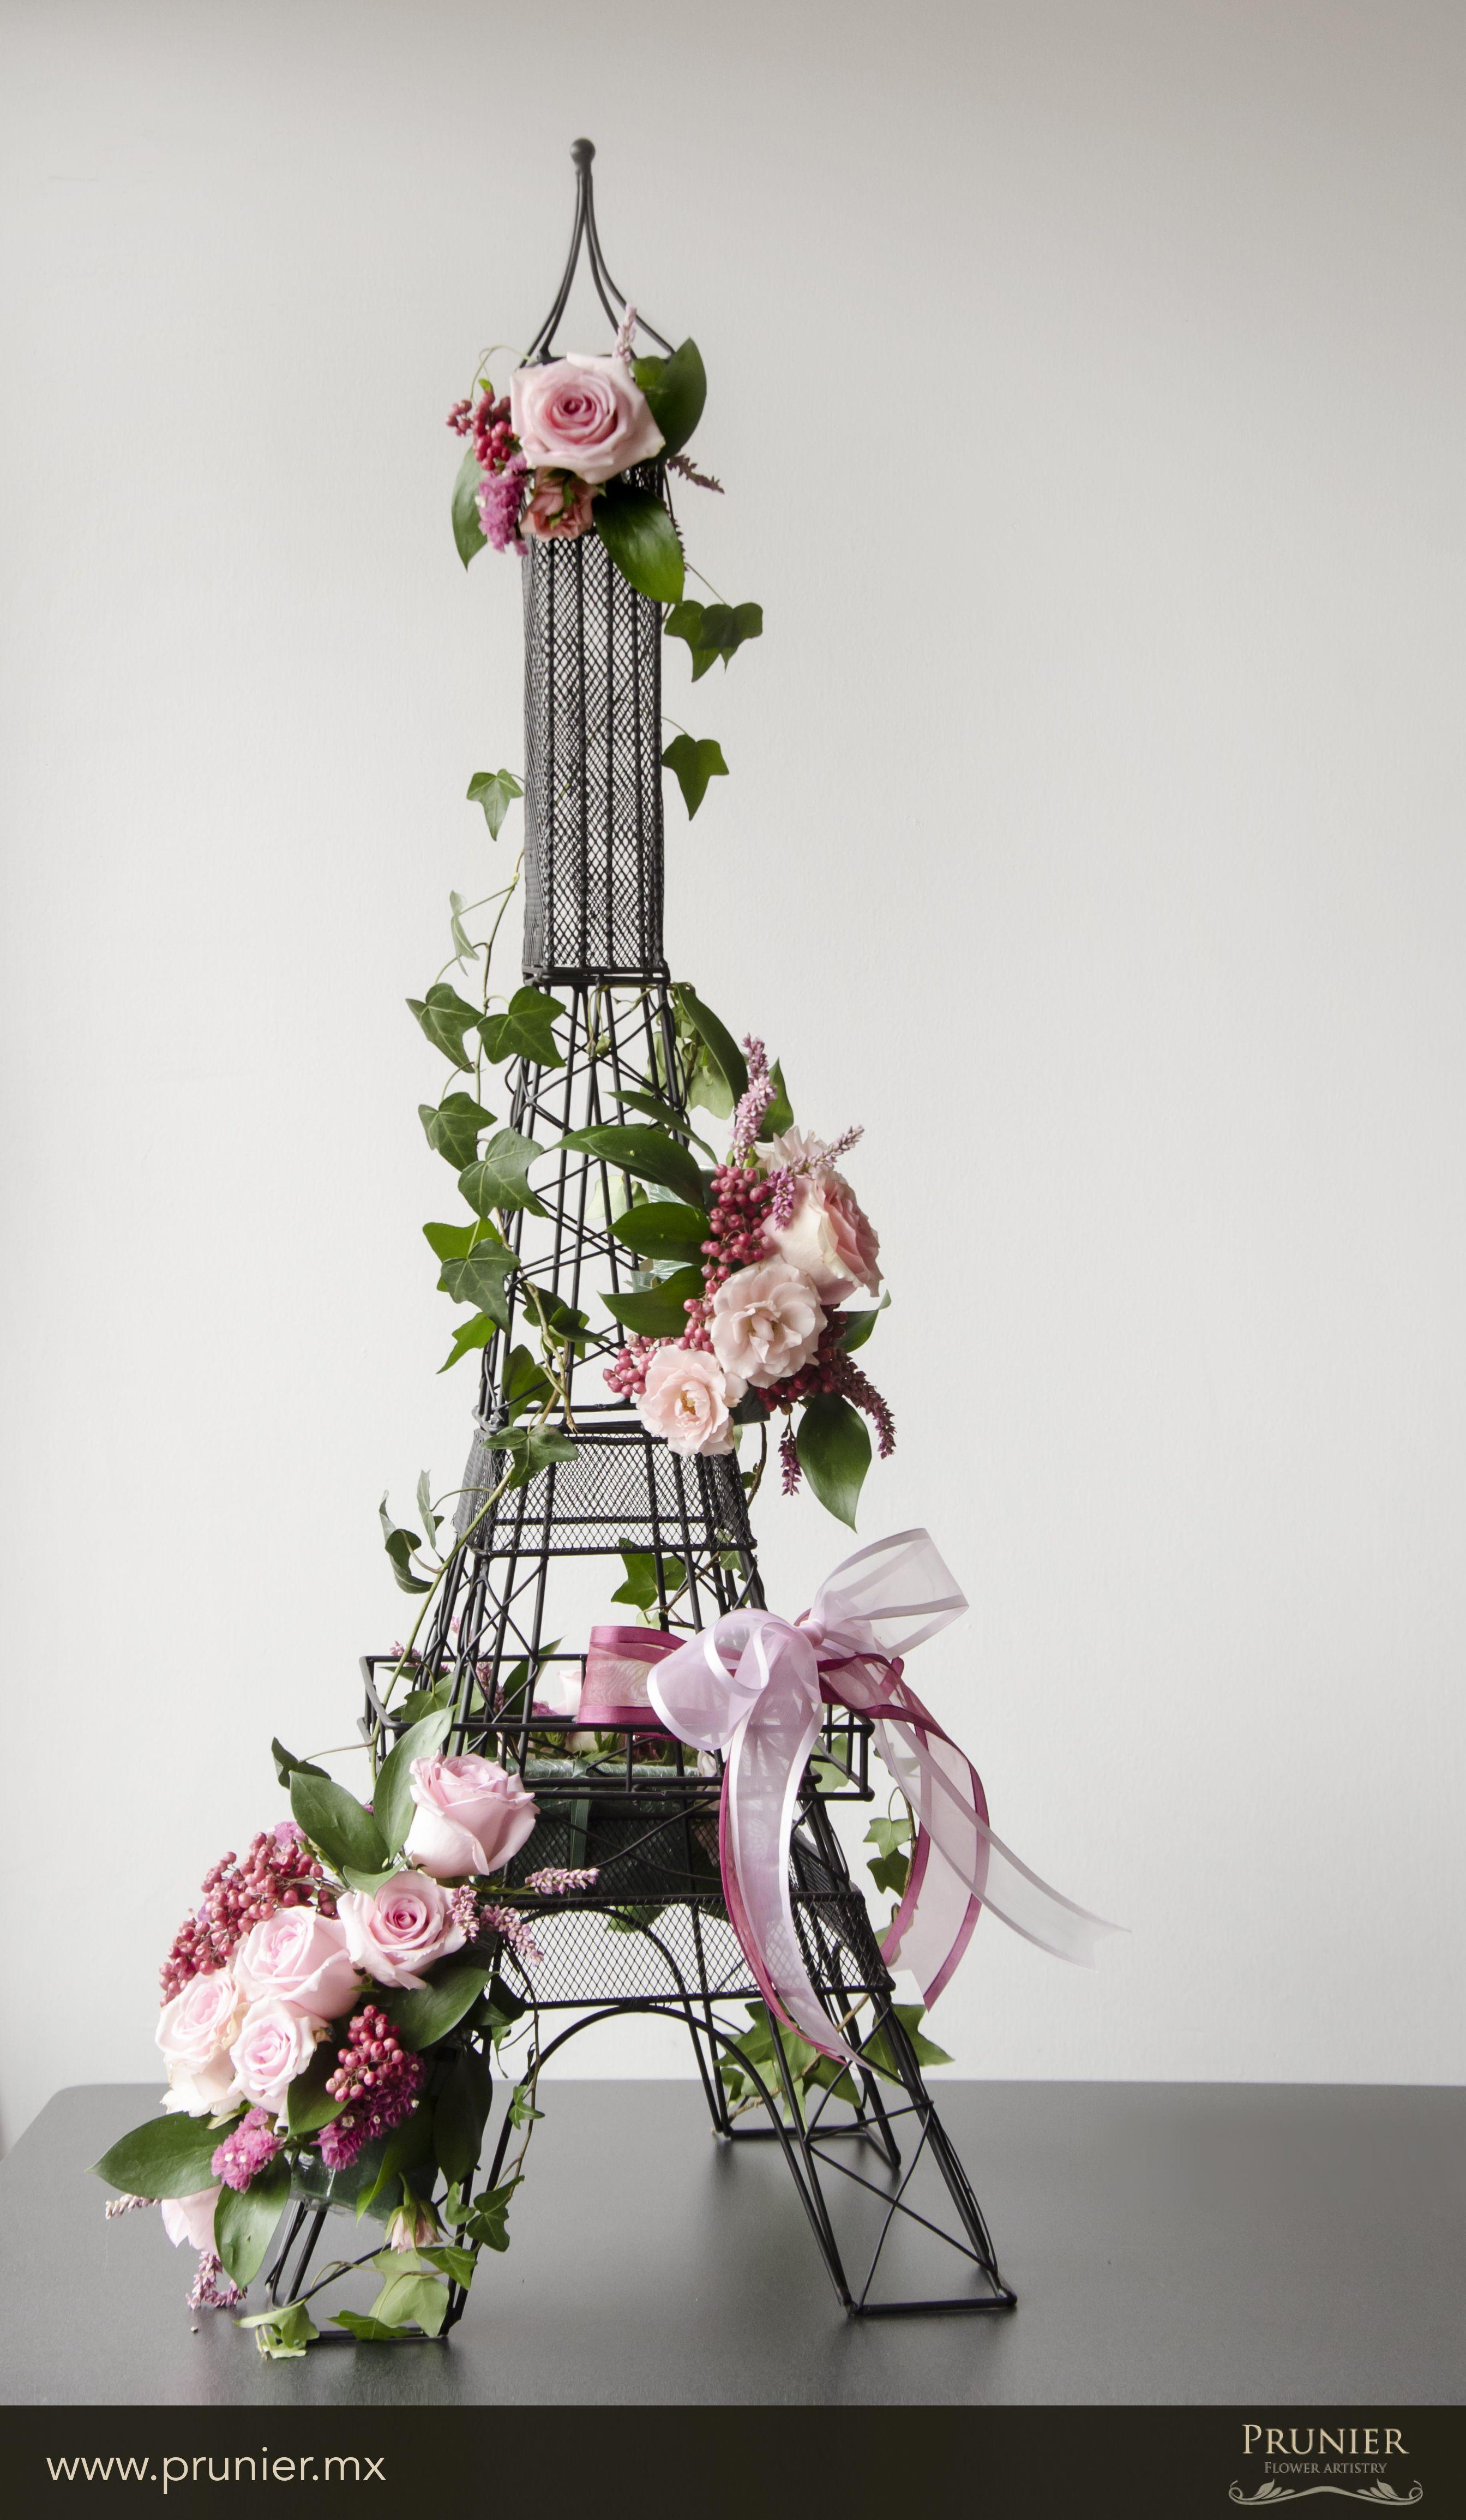 Pin By Prunier On Paris Flower Arrangements